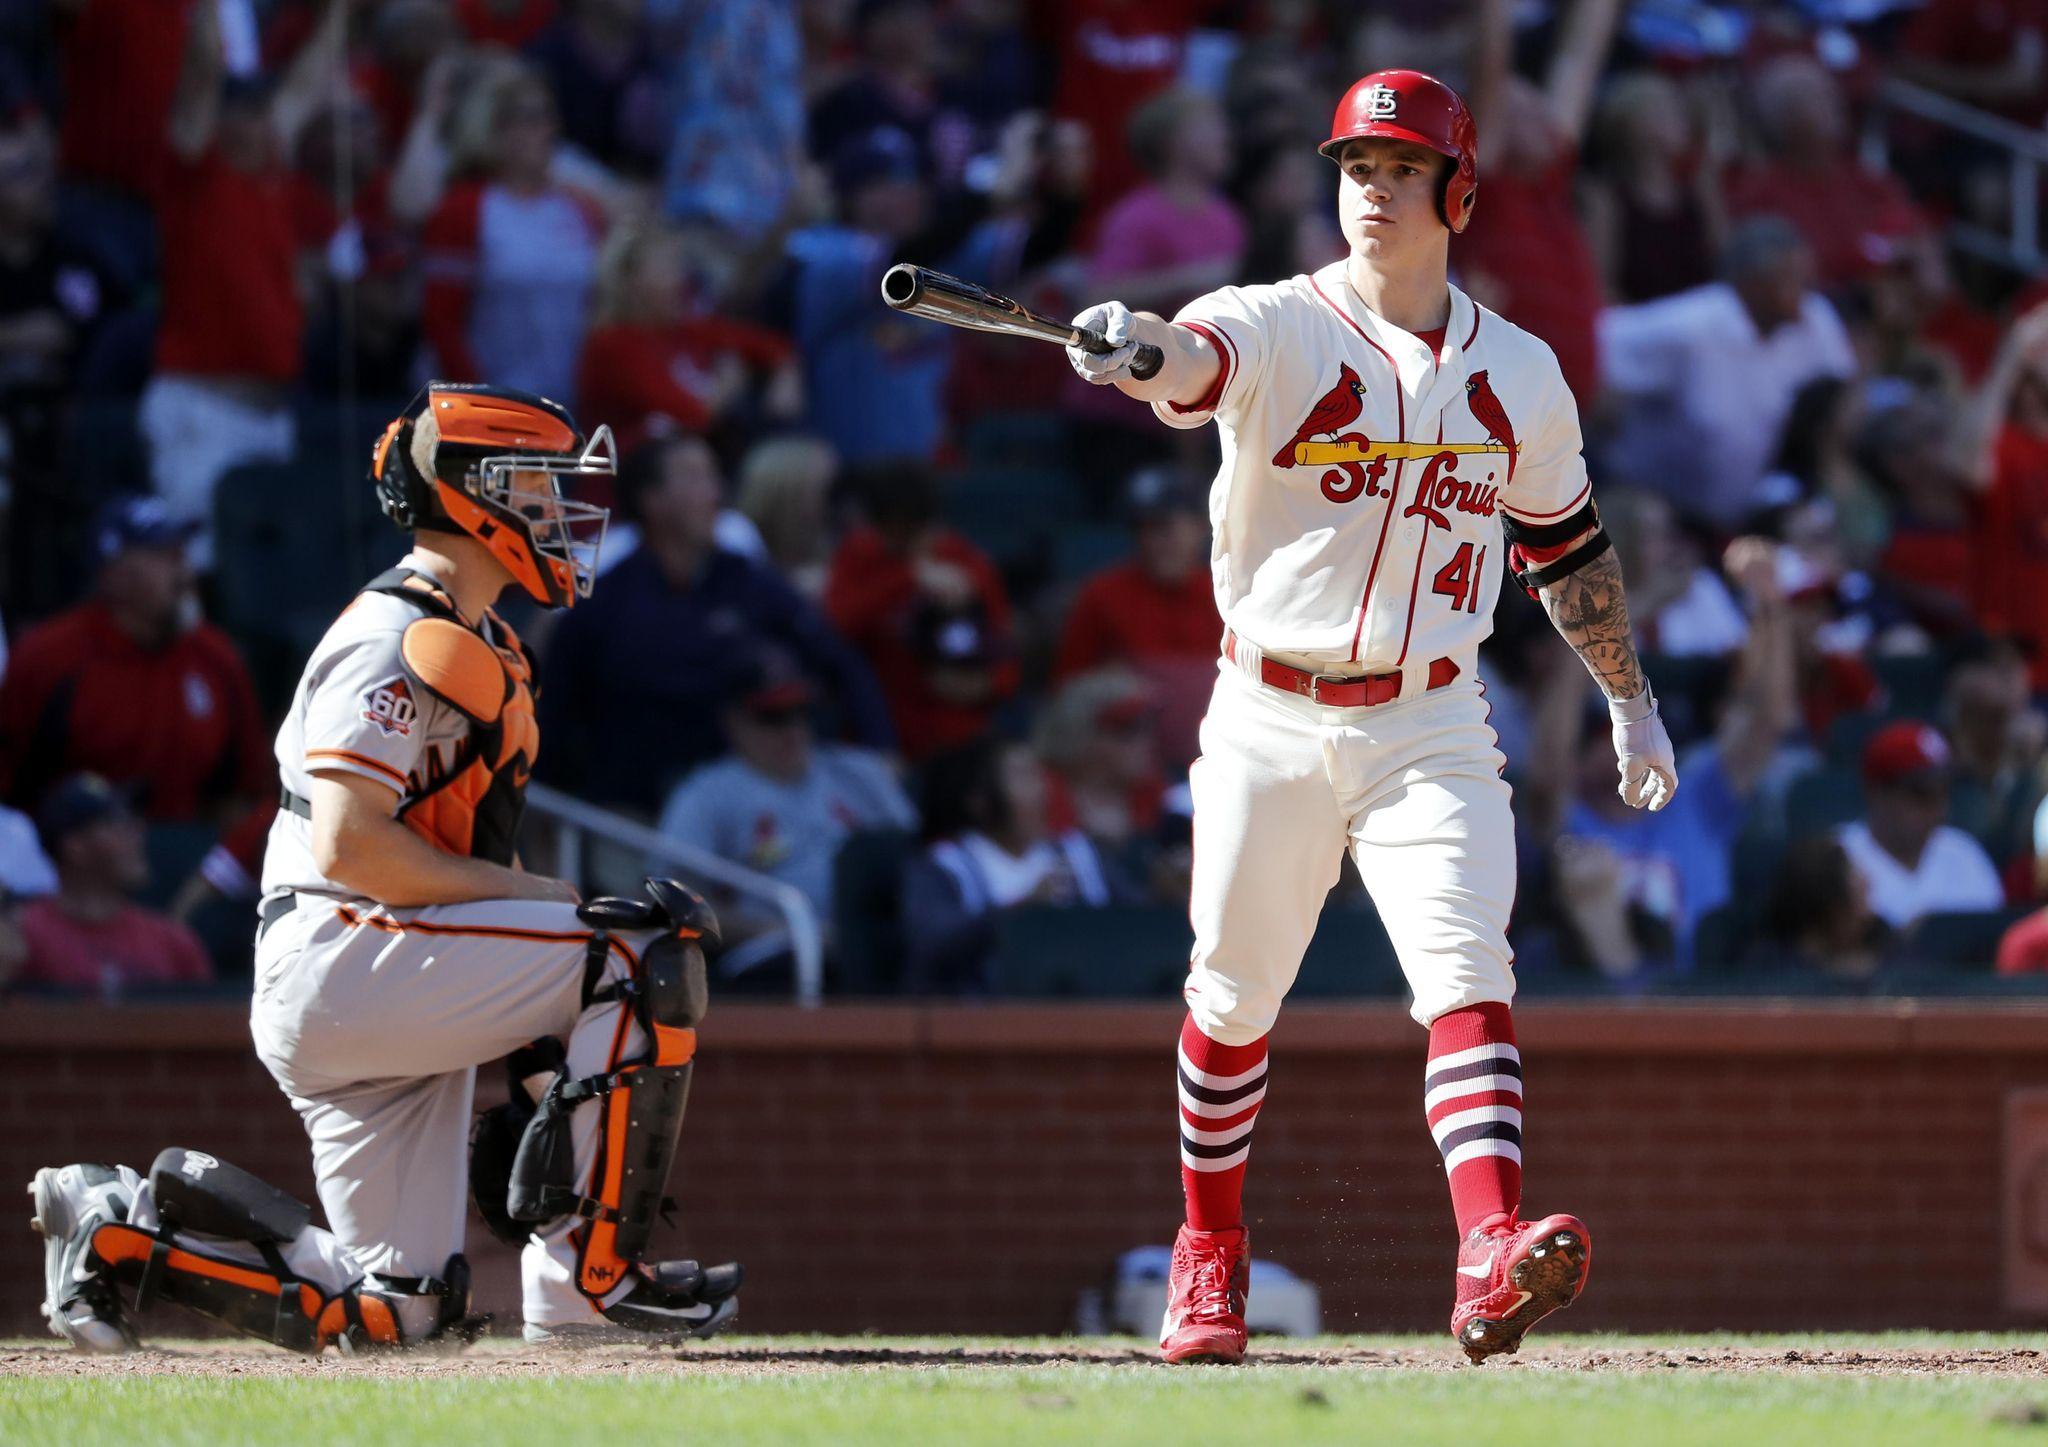 Giants_cardinals_baseball_81490_s2048x1447